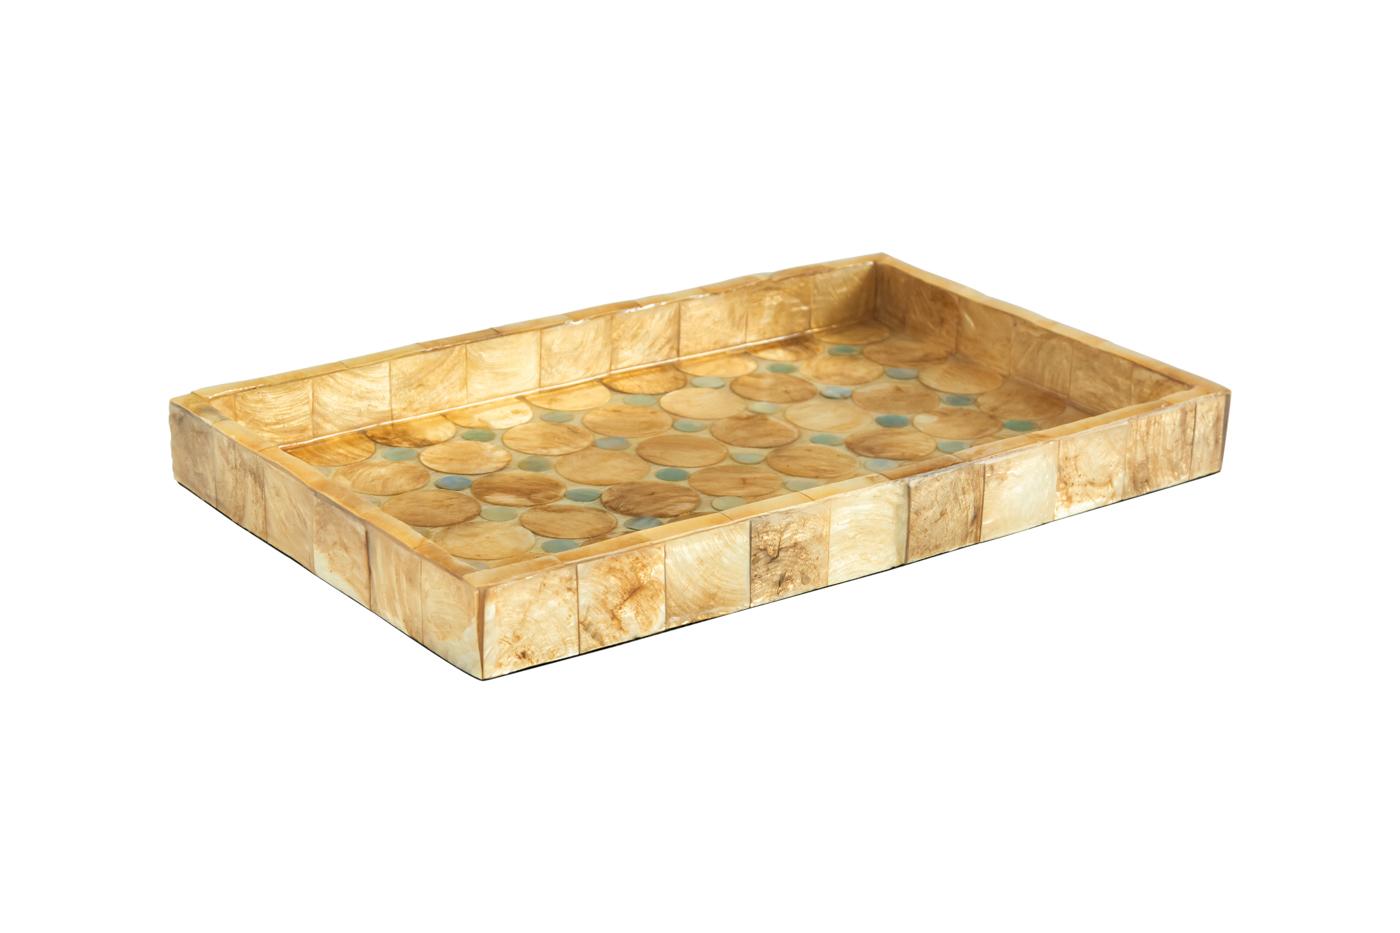 Bandeja rectangular en madera cubierta con nácar